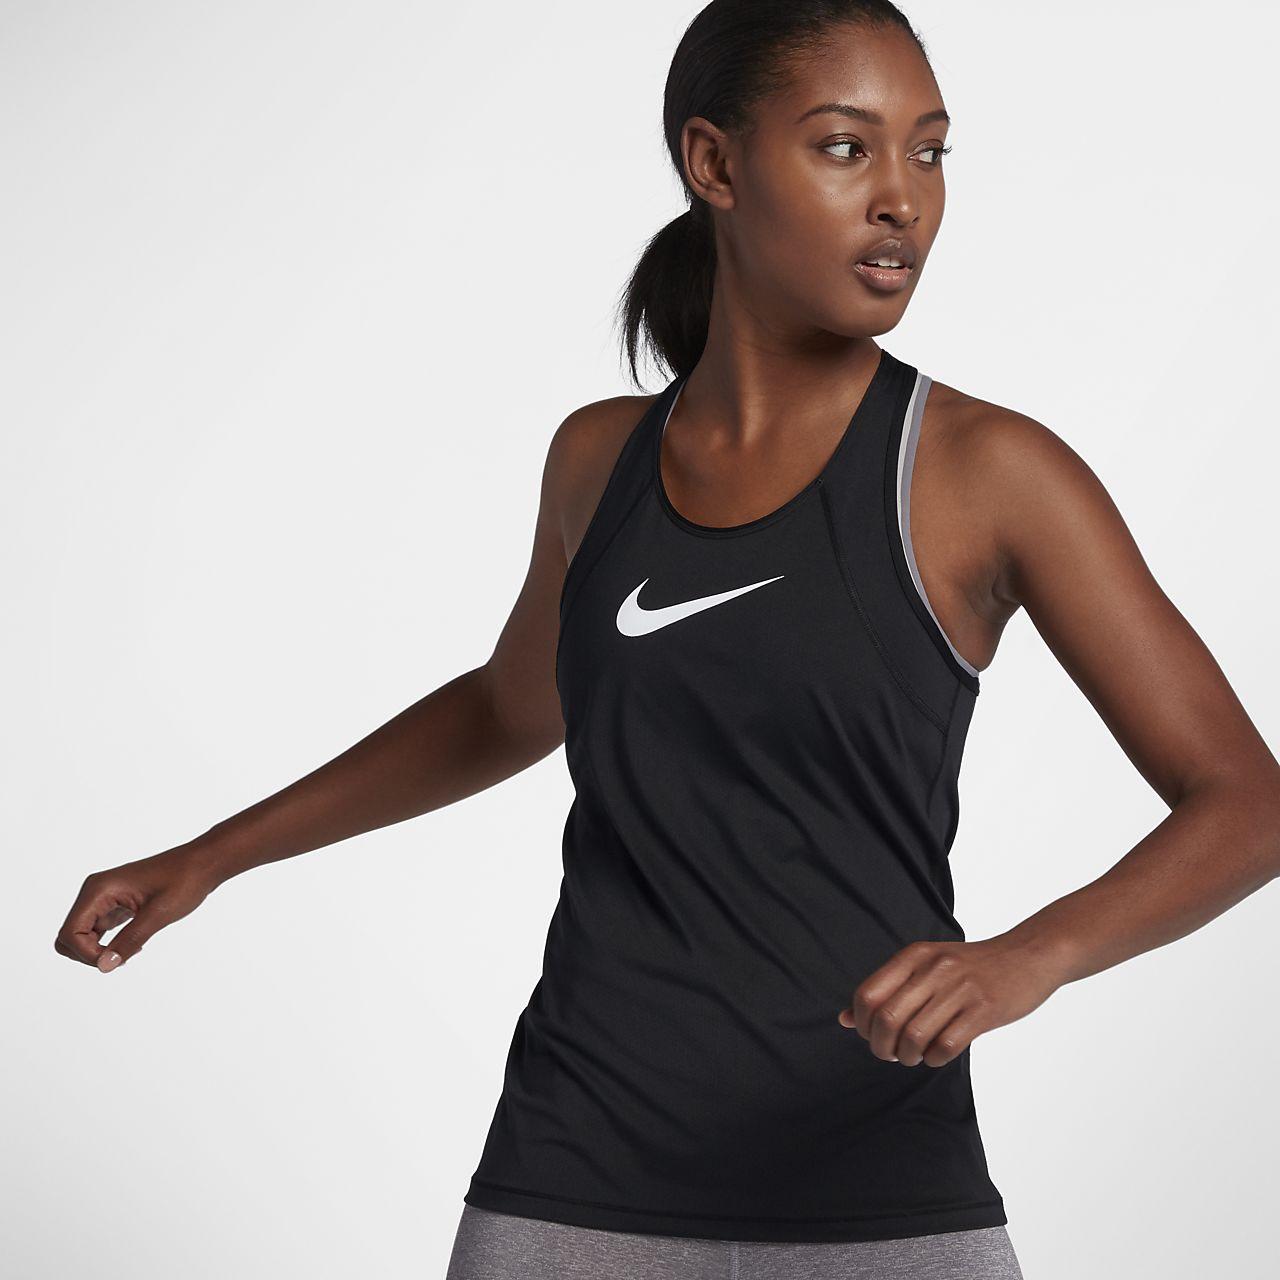 f5d955631a65 Low Resolution Γυναικείο φανελάκι προπόνησης Nike Pro Γυναικείο φανελάκι προπόνησης  Nike Pro